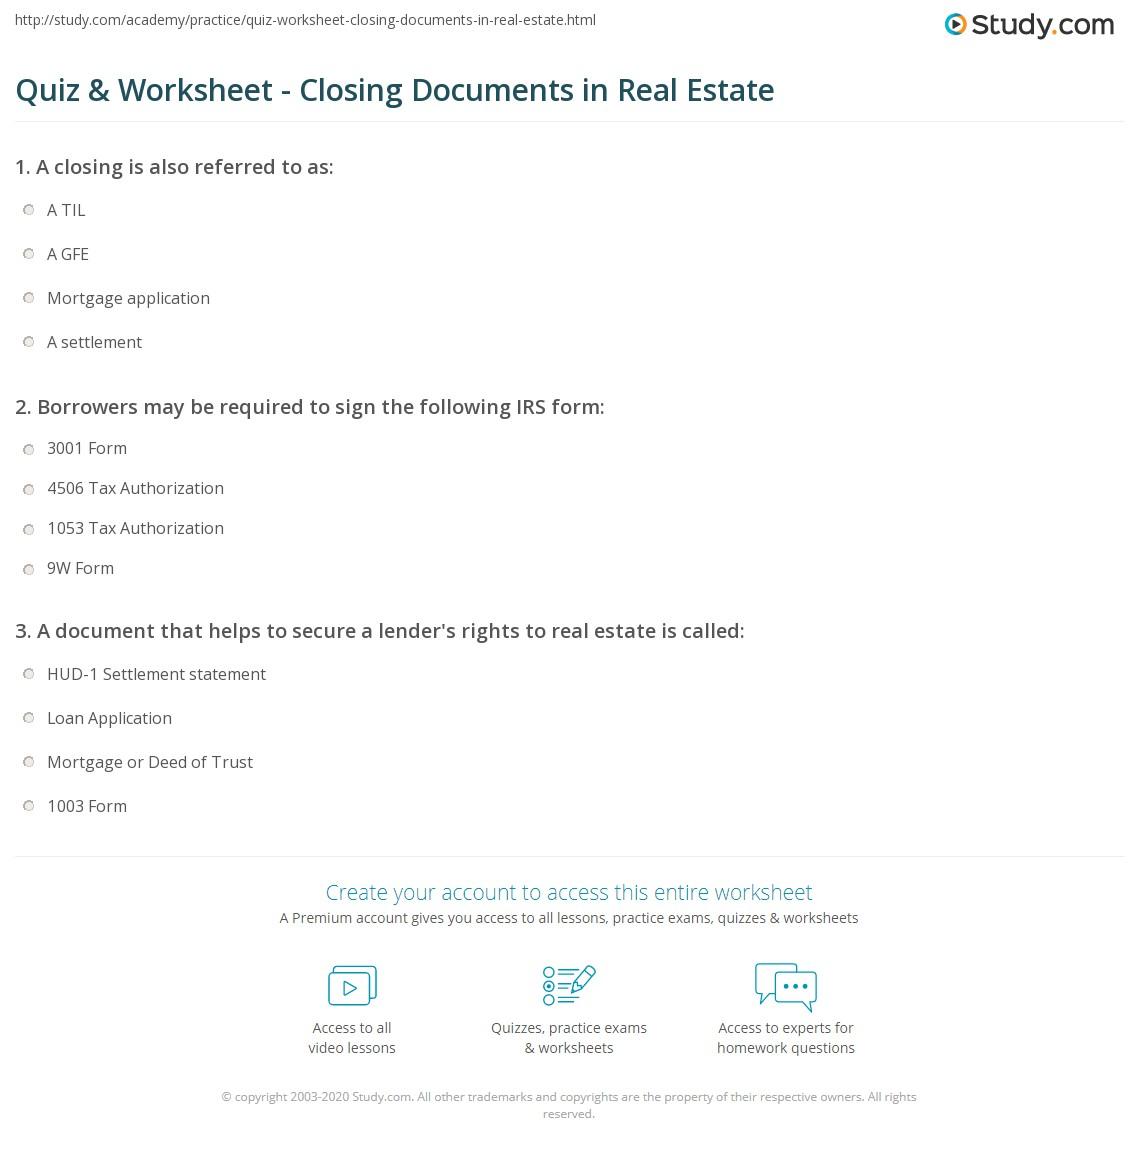 Worksheets Closing Cost Worksheet quiz worksheet closing documents in real estate study com print overview description worksheet